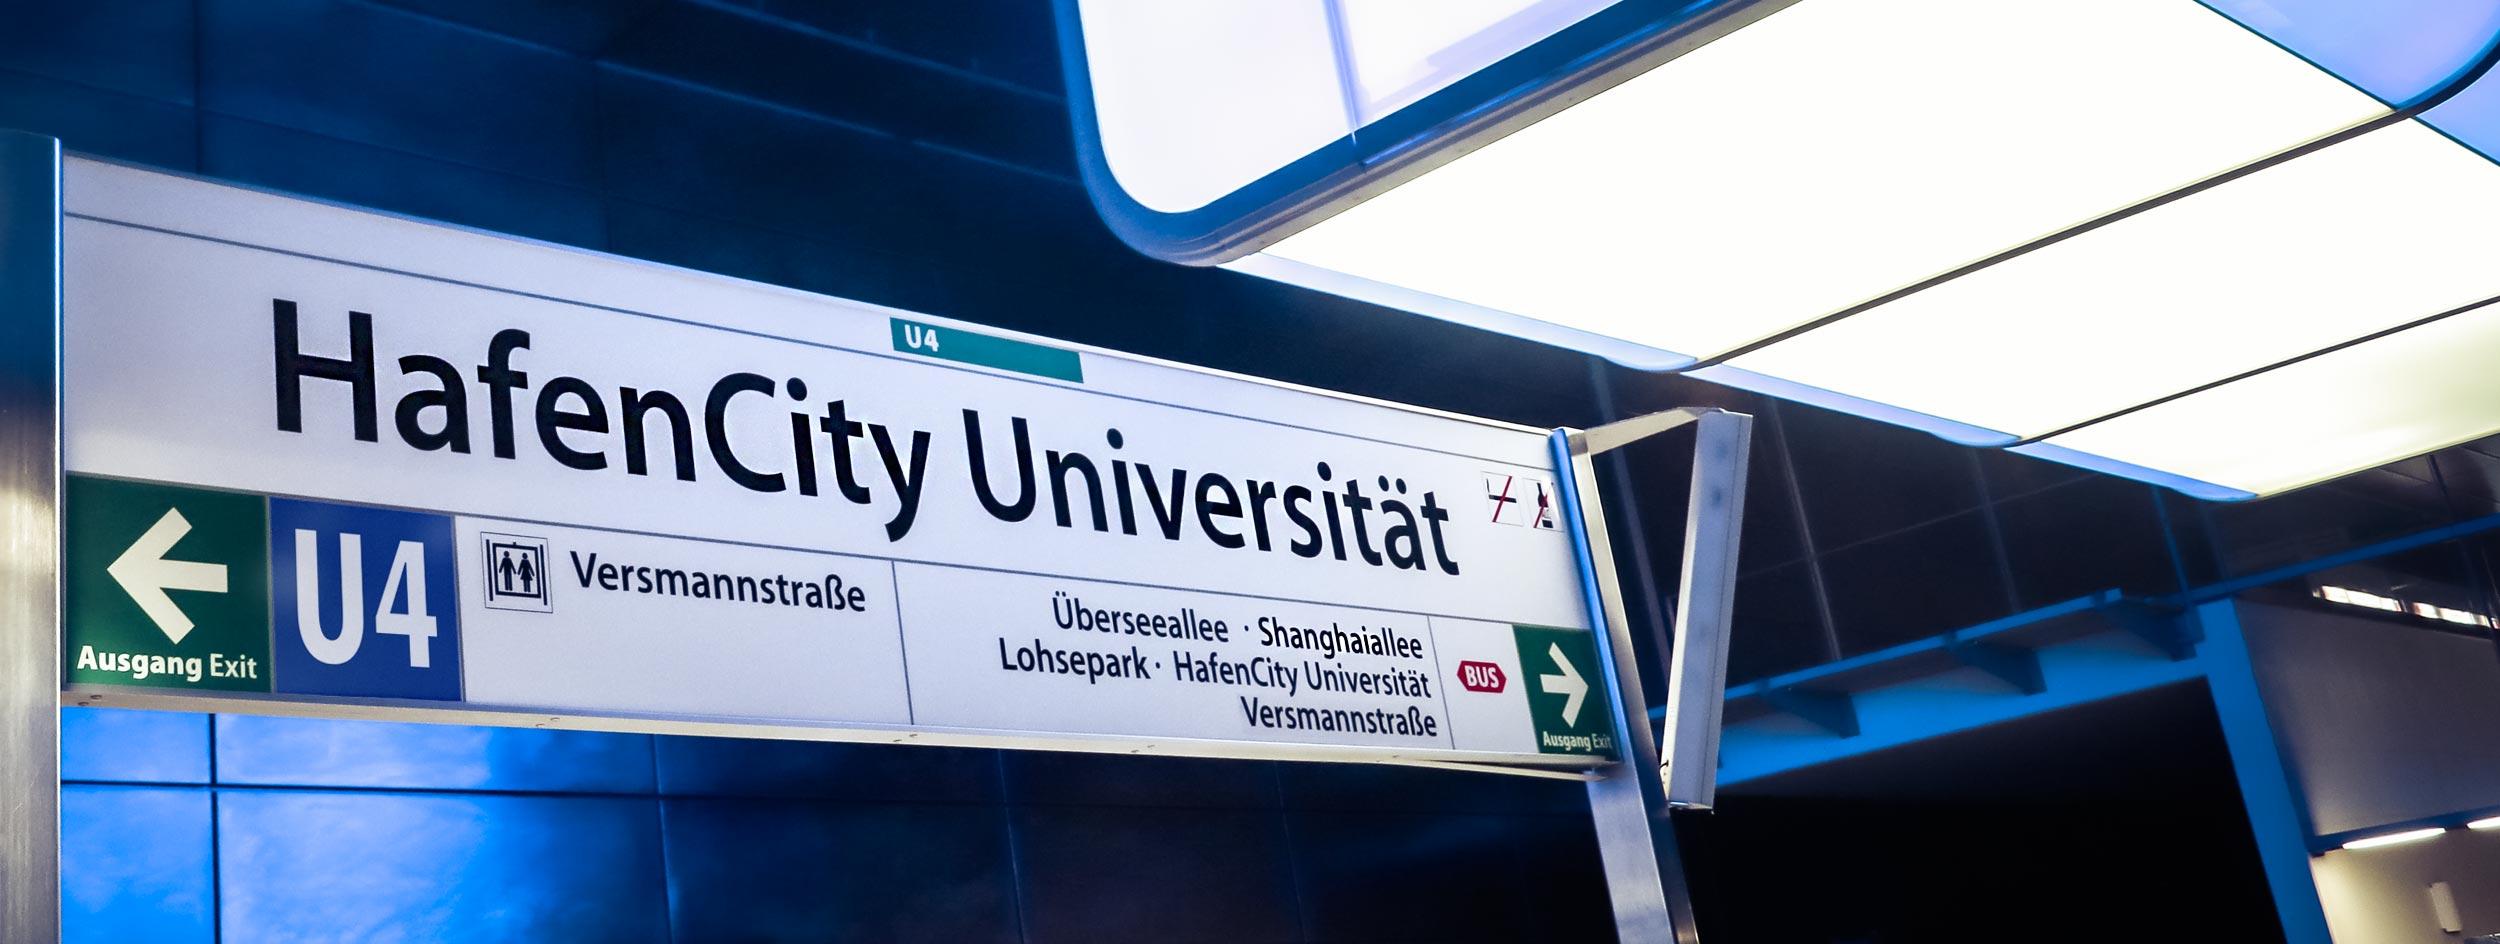 onlineagentur-hafencity-hamburg-2elbufer-werbeagentur